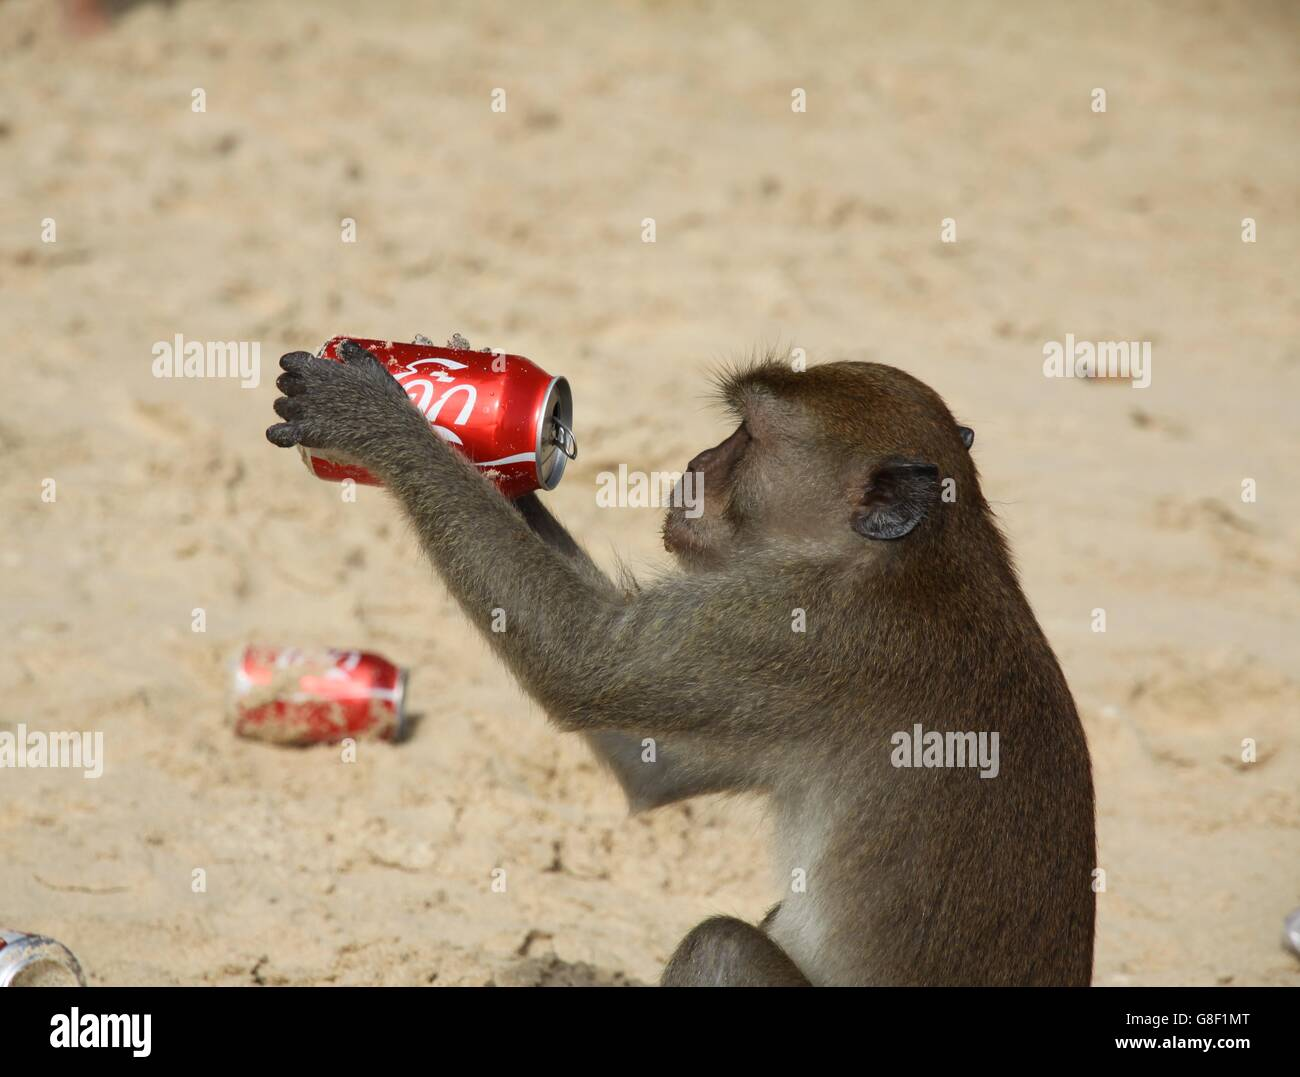 Longtaile Makaken Affen Getränke Koks am Strand, Thailand Stockfoto ...